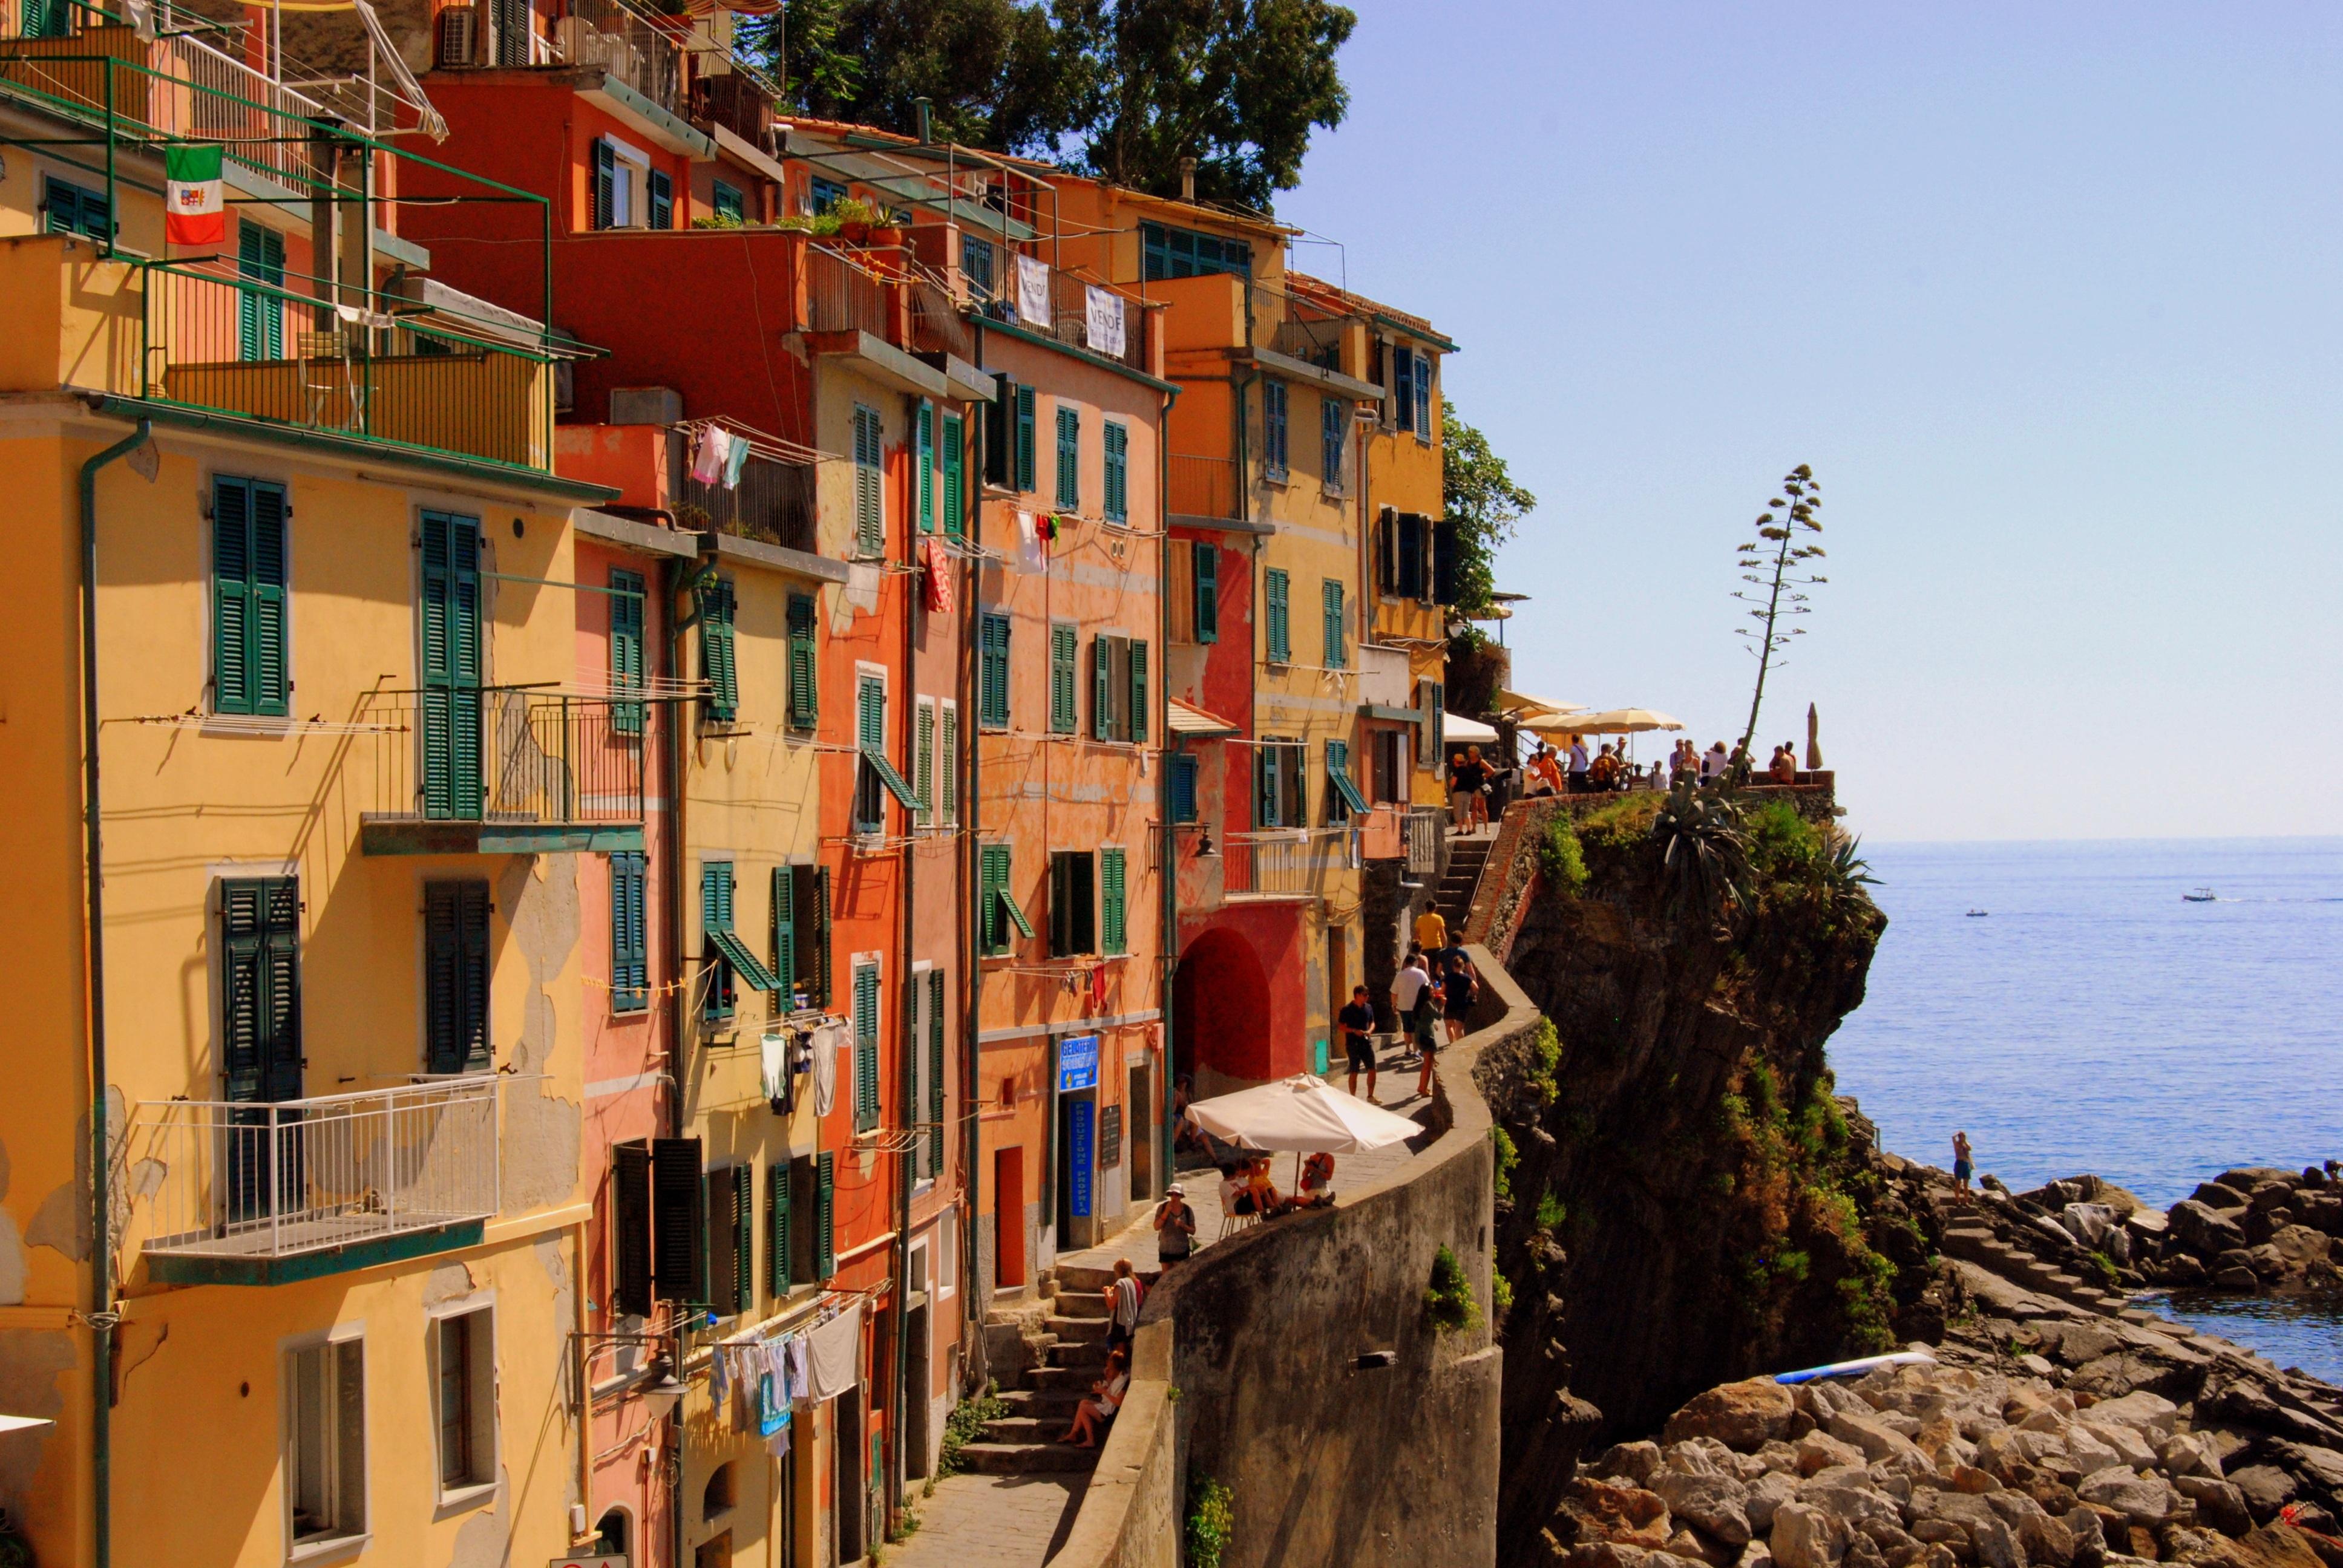 Häuser Italien kostenlose foto landschaft meer küste wasser stadt italien